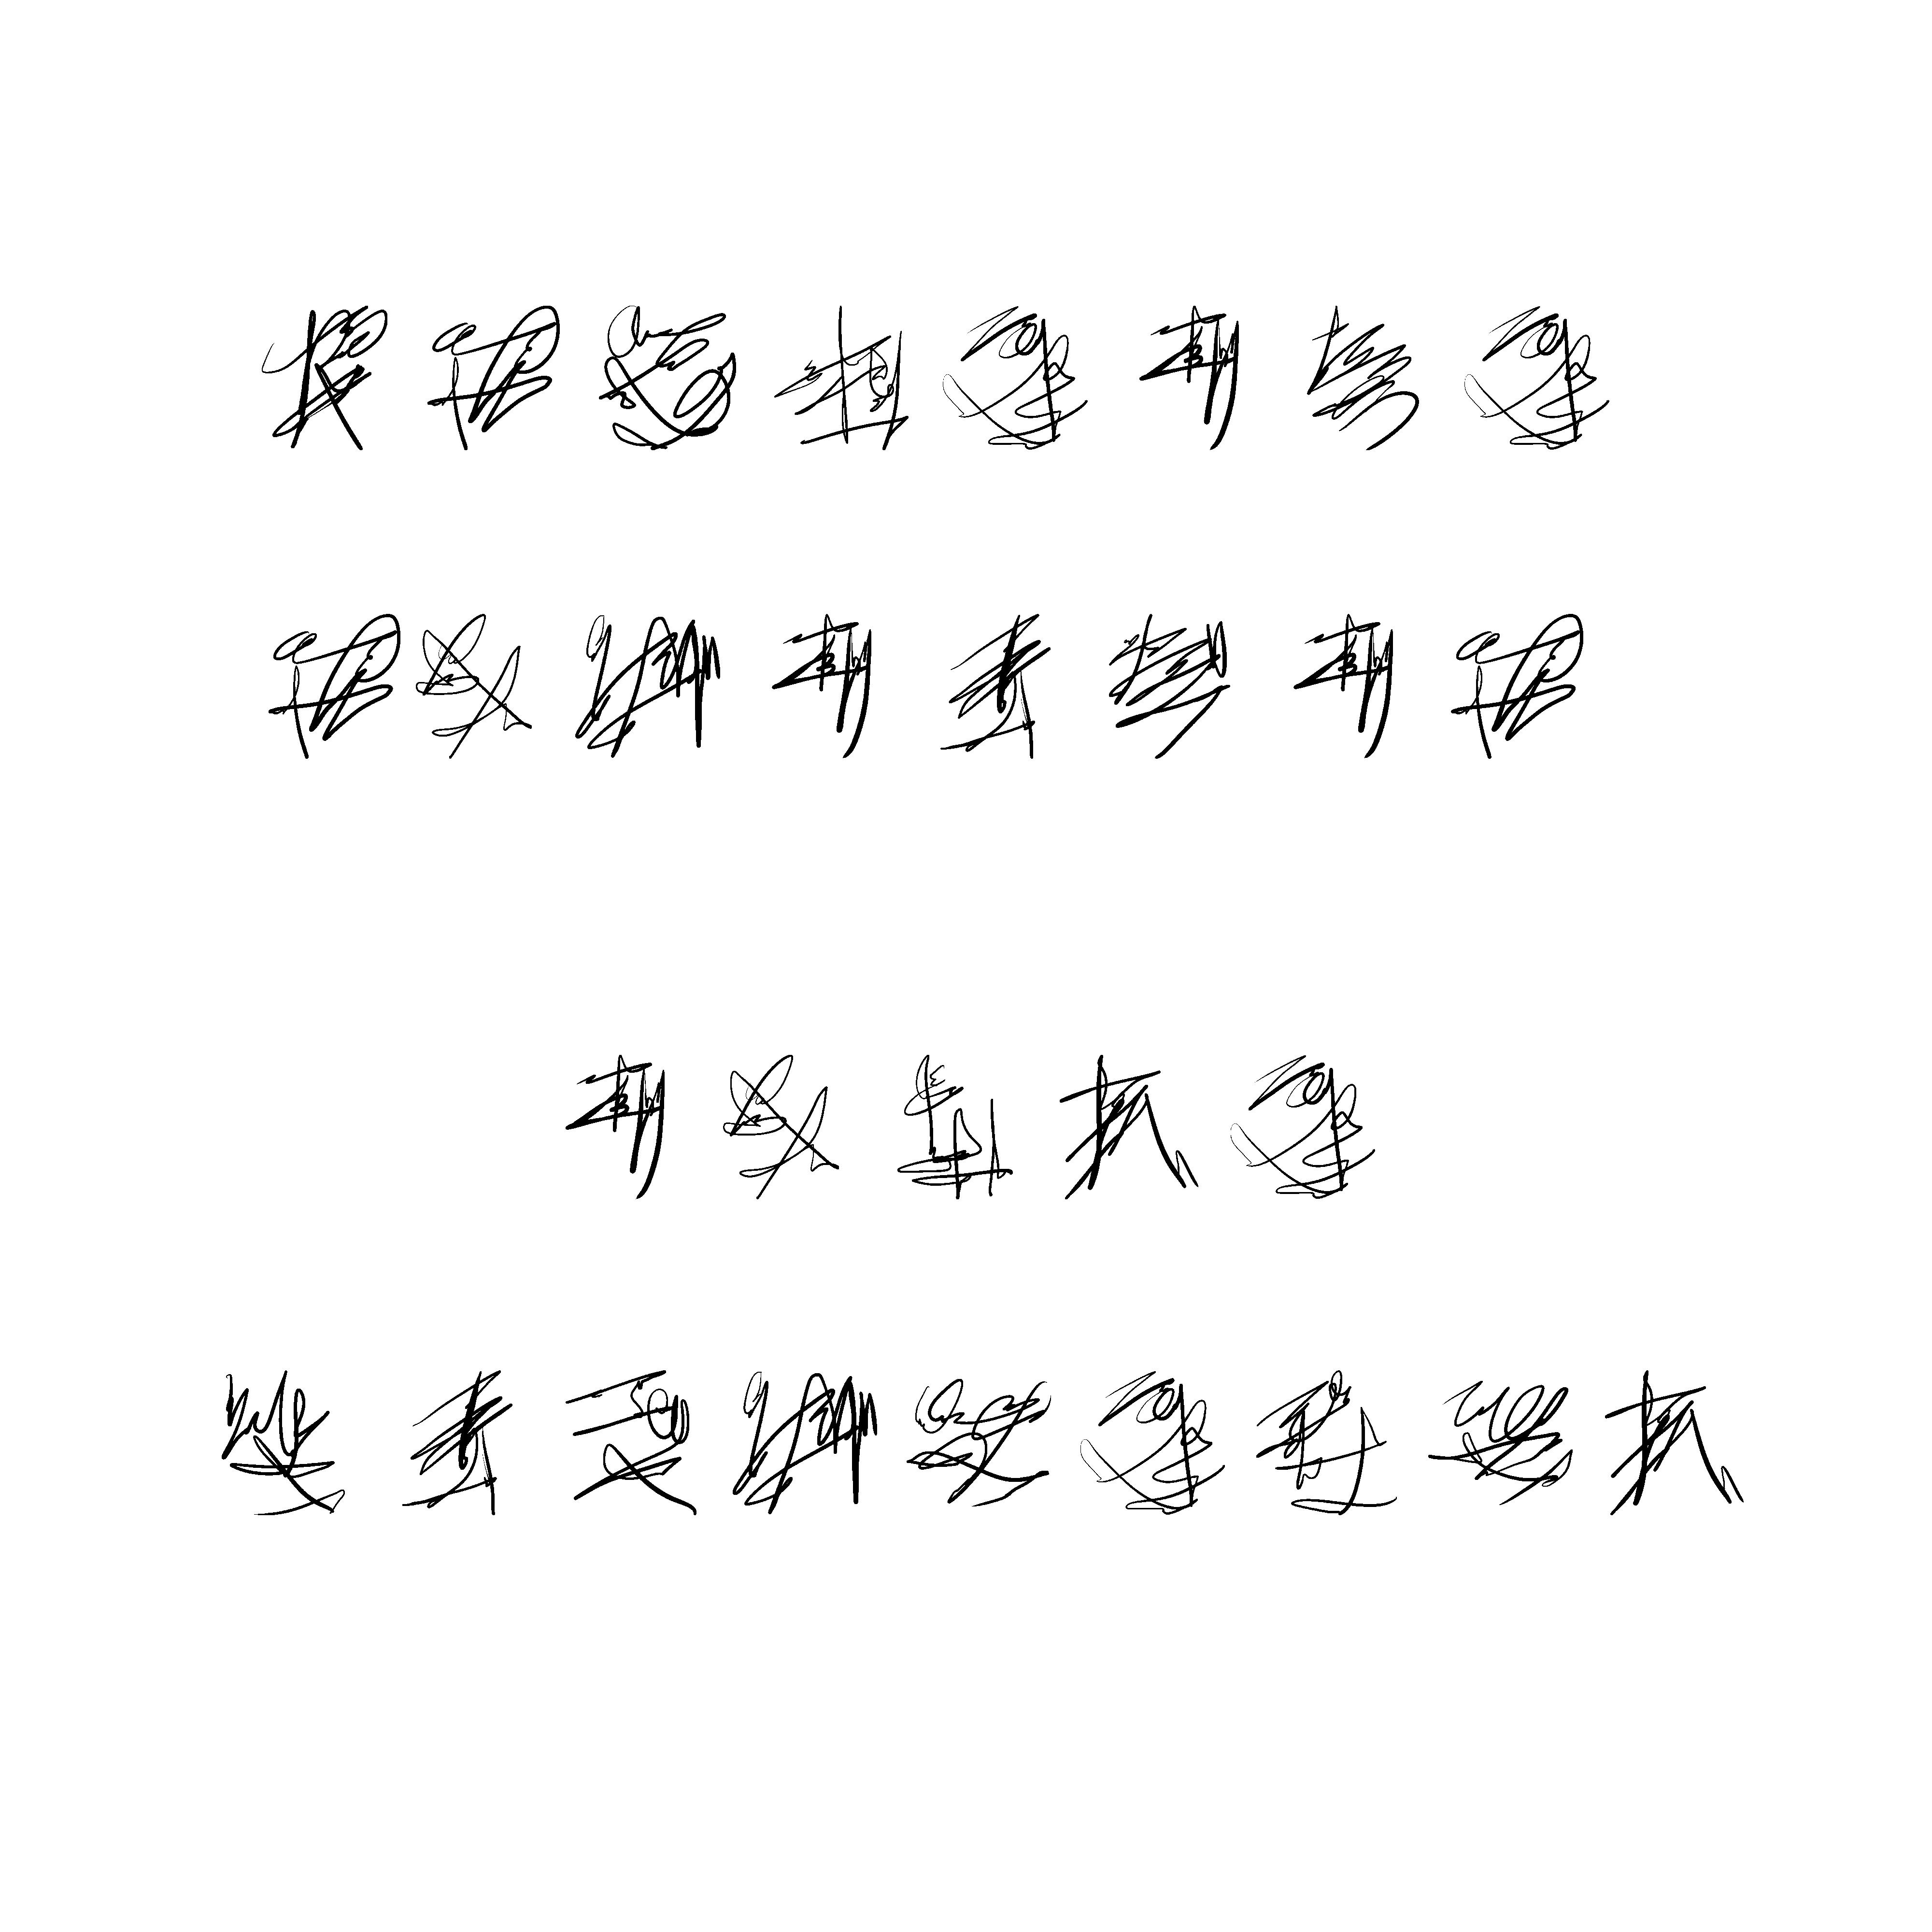 背景屋 漫画・イラスト用無料素材配布サイト〔商用利用可〕 : 〔背景